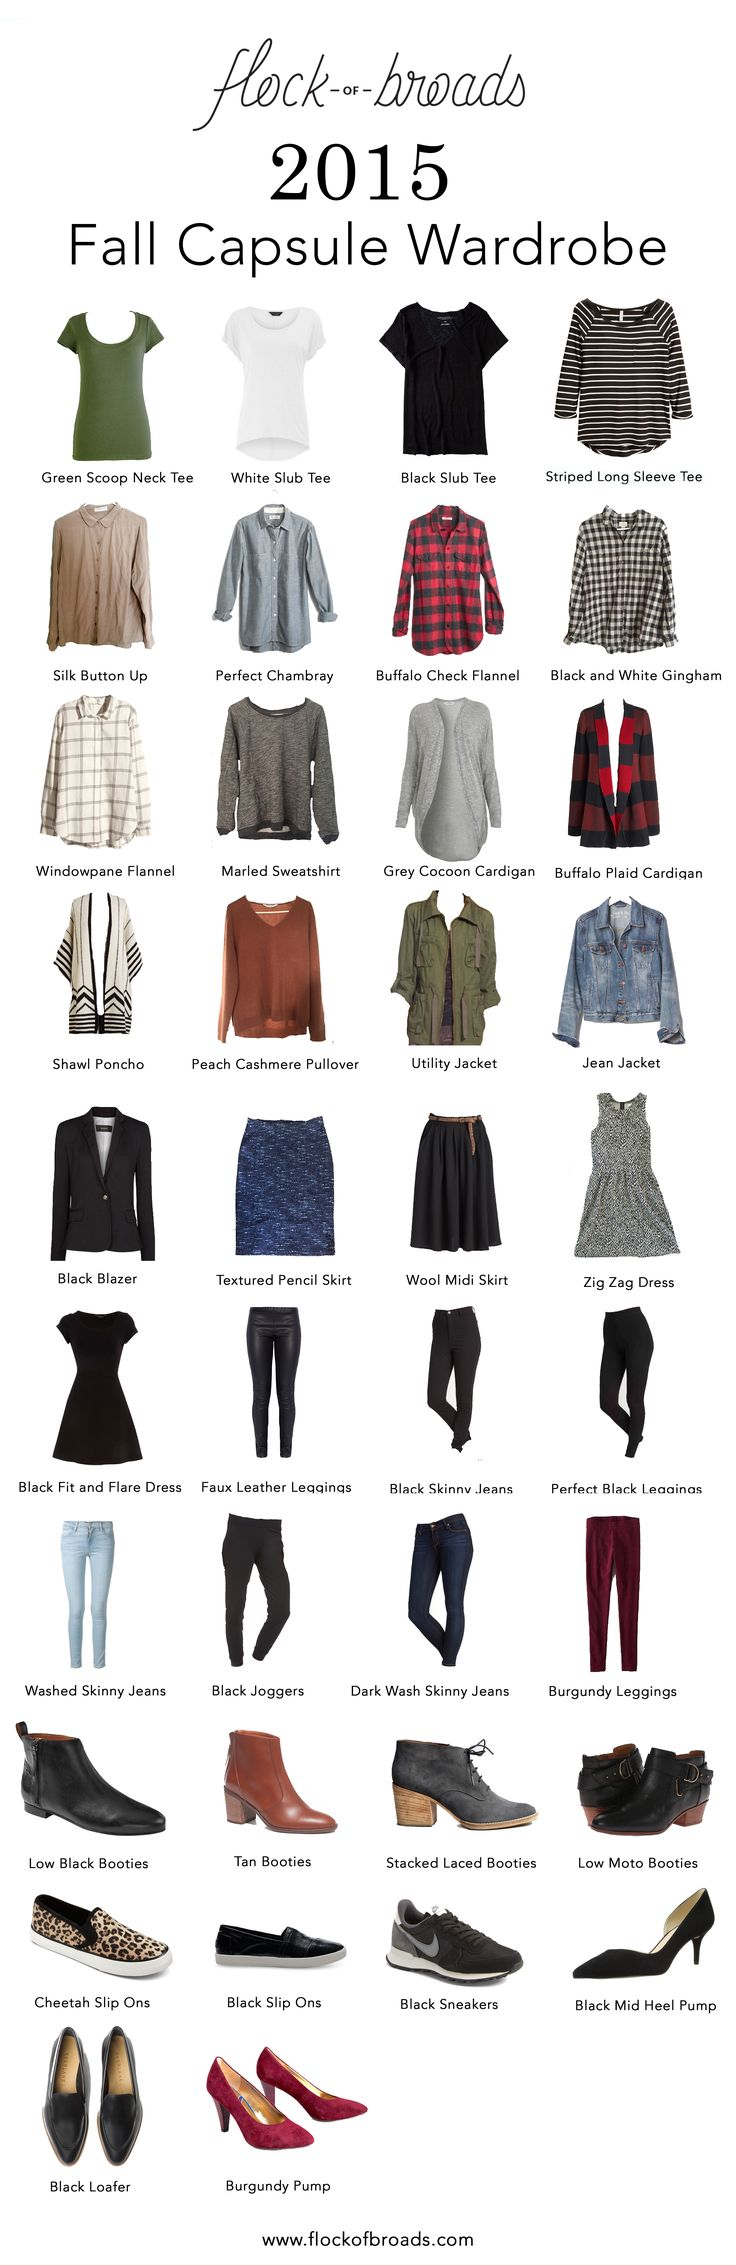 2015 Fall Capsule Wardrobe